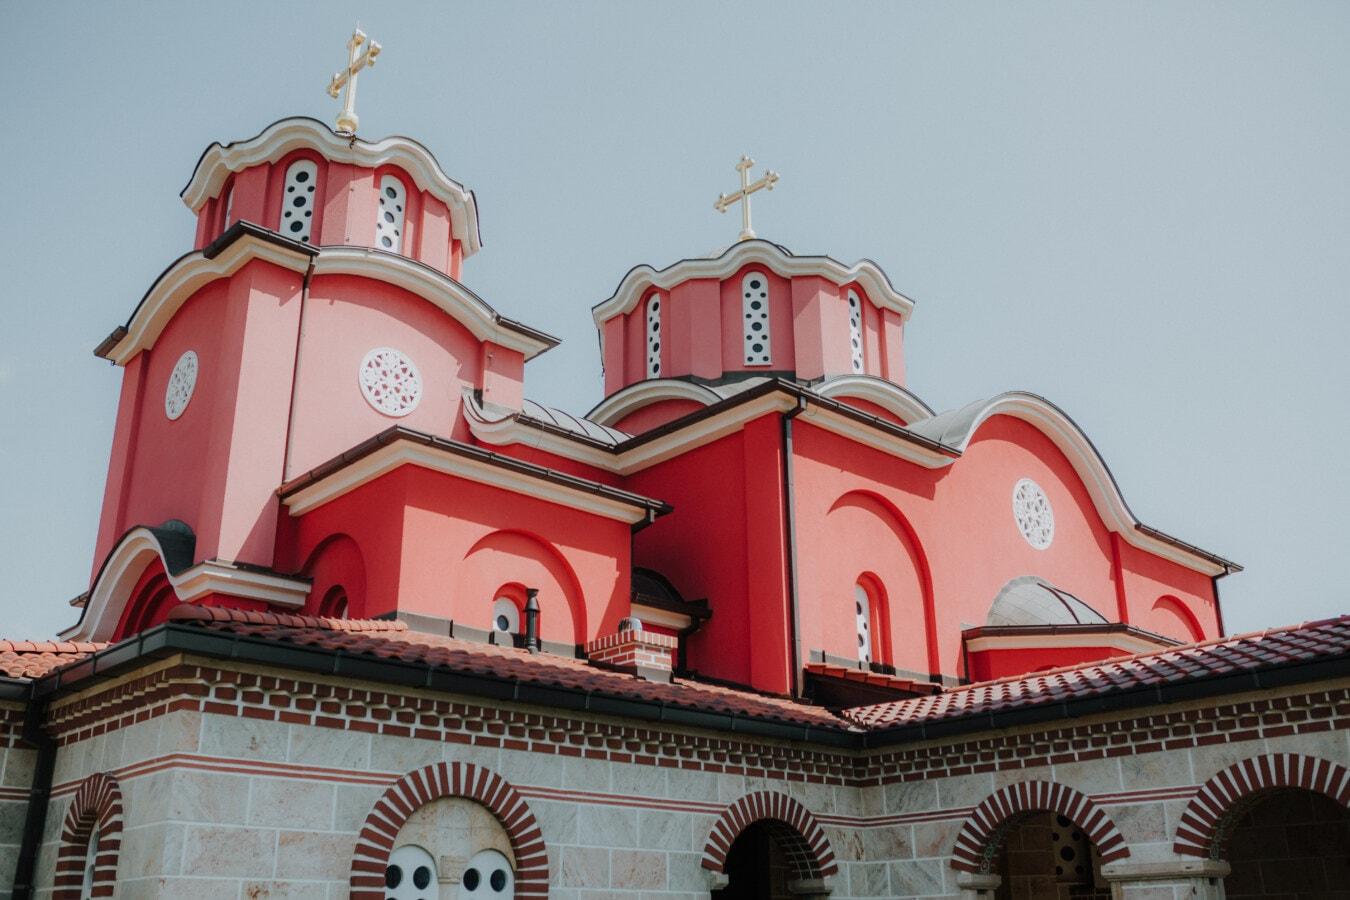 dunkelrot, Byzantinische, Kirchturm, kathedrale, Kloster, Fassade, Christentum, Architektur, Turm, Religion